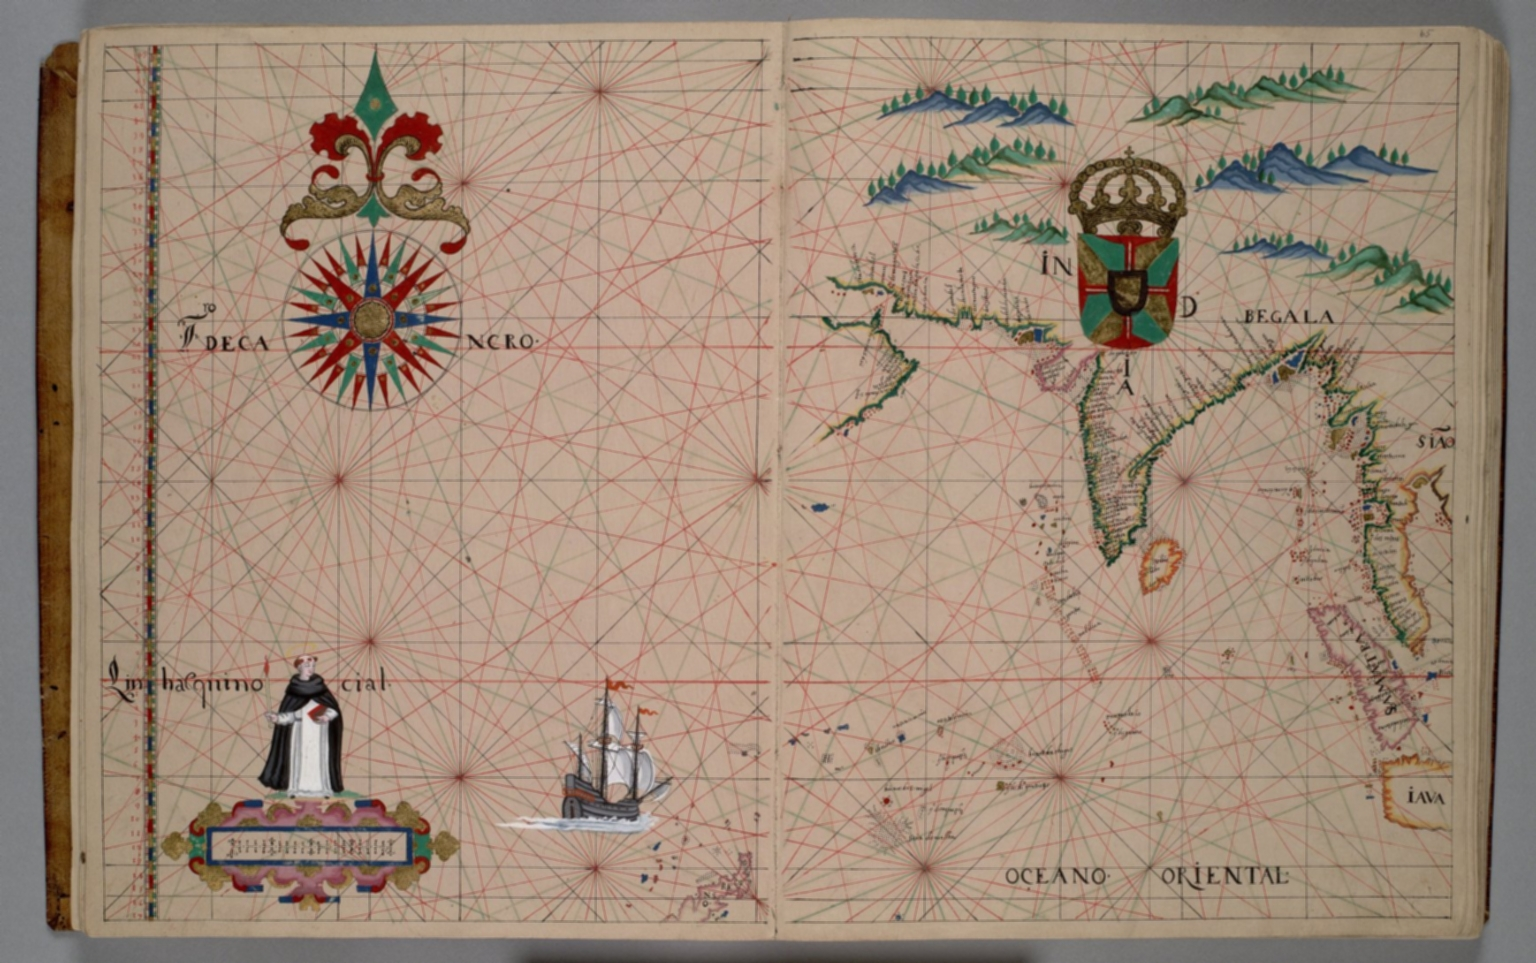 Northern Indian Ocean, India